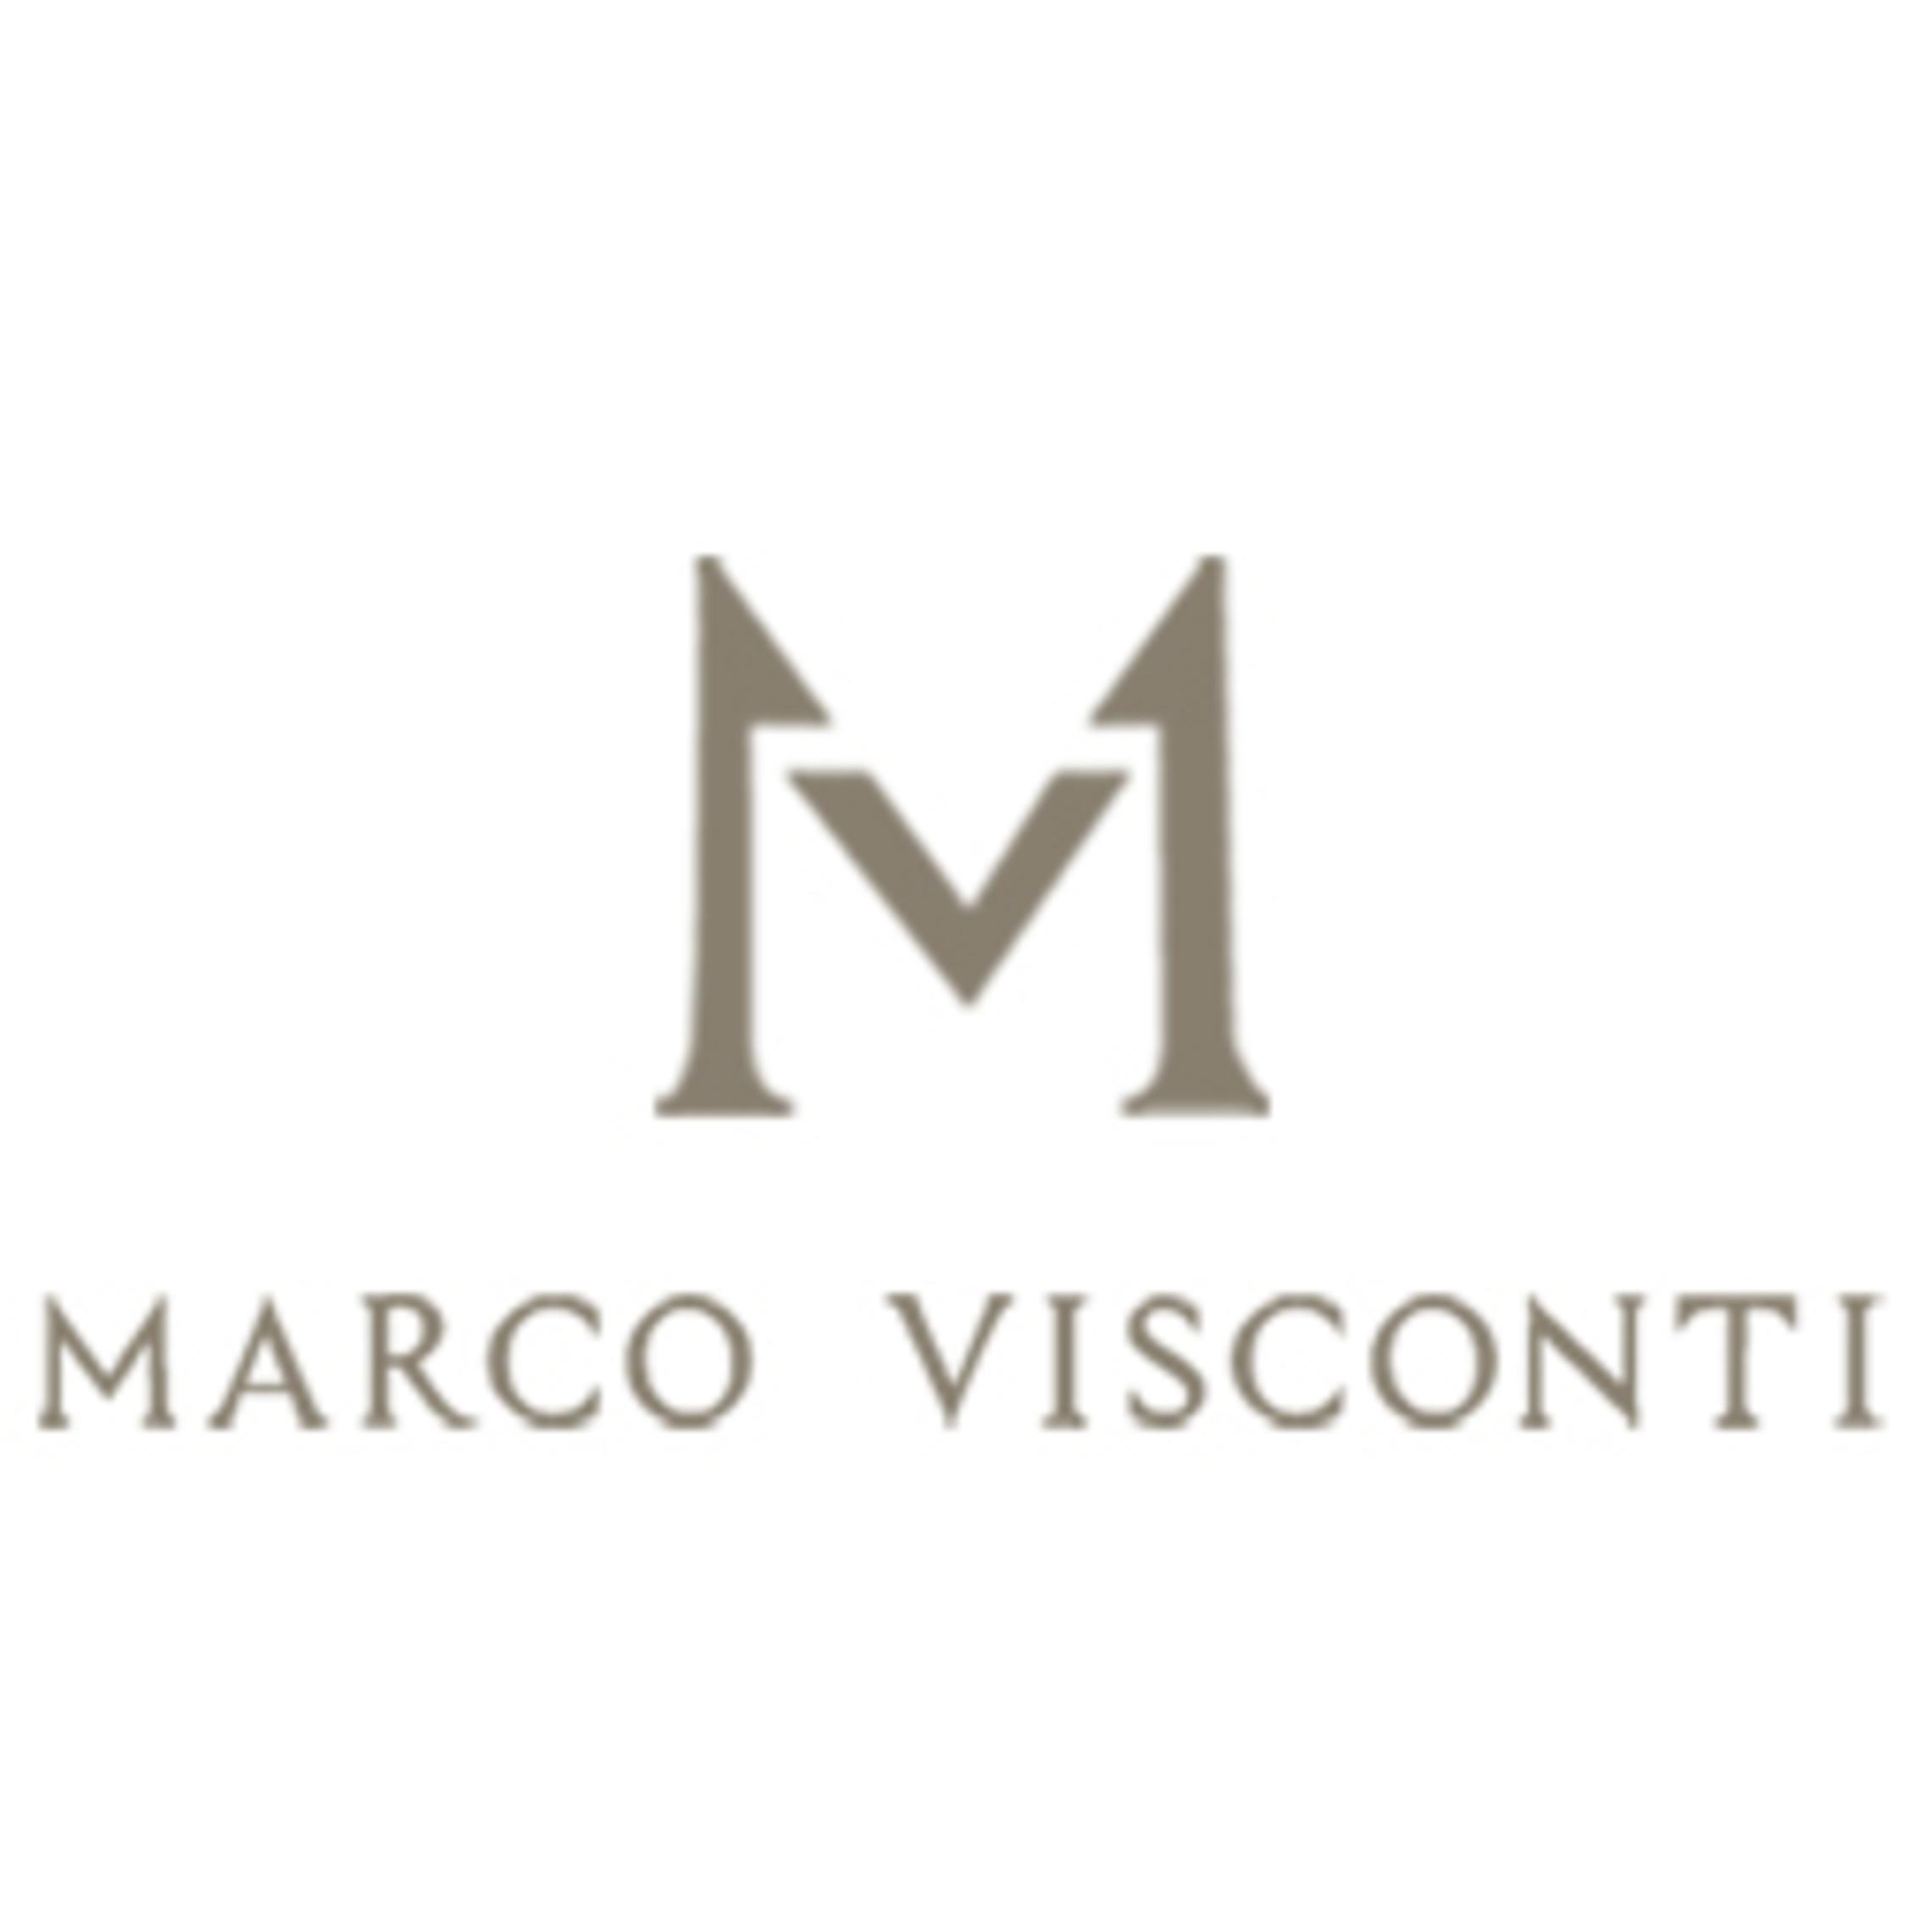 marco visconti- company logo